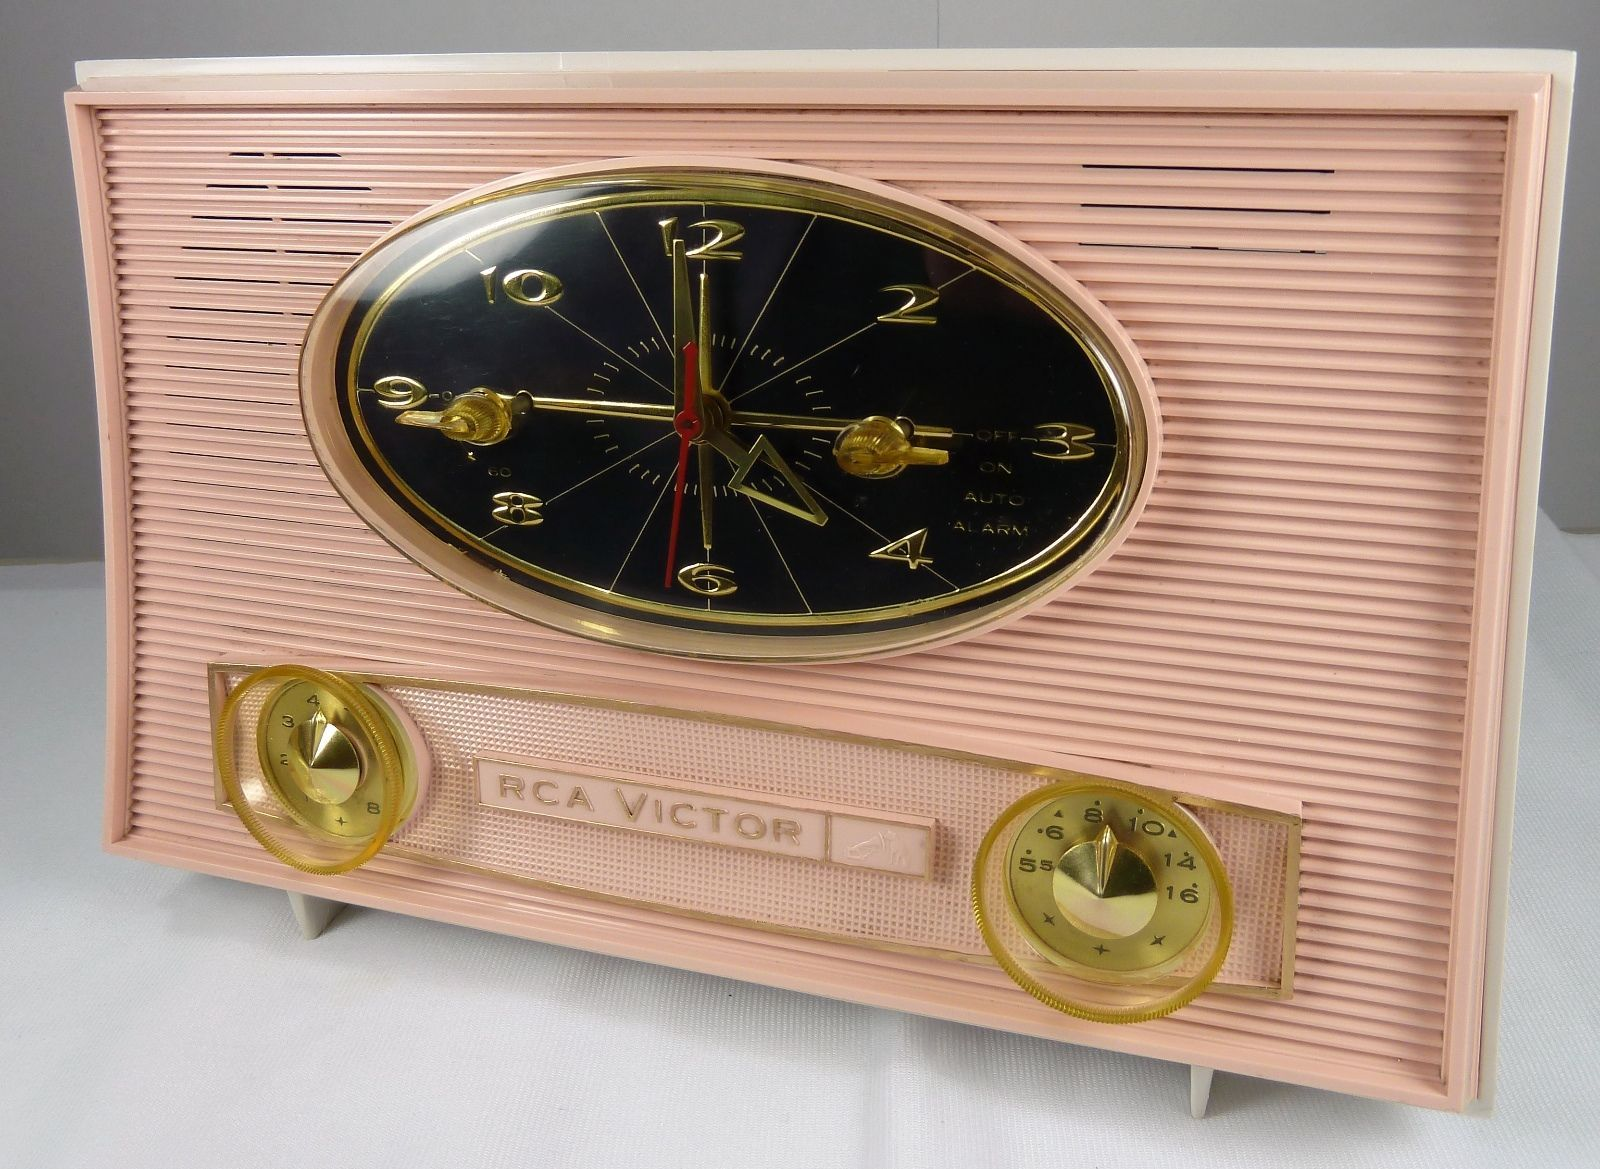 Restored Vintage 1950's RCA Victor Tube Clock Radio Pretty and Pink | eBay